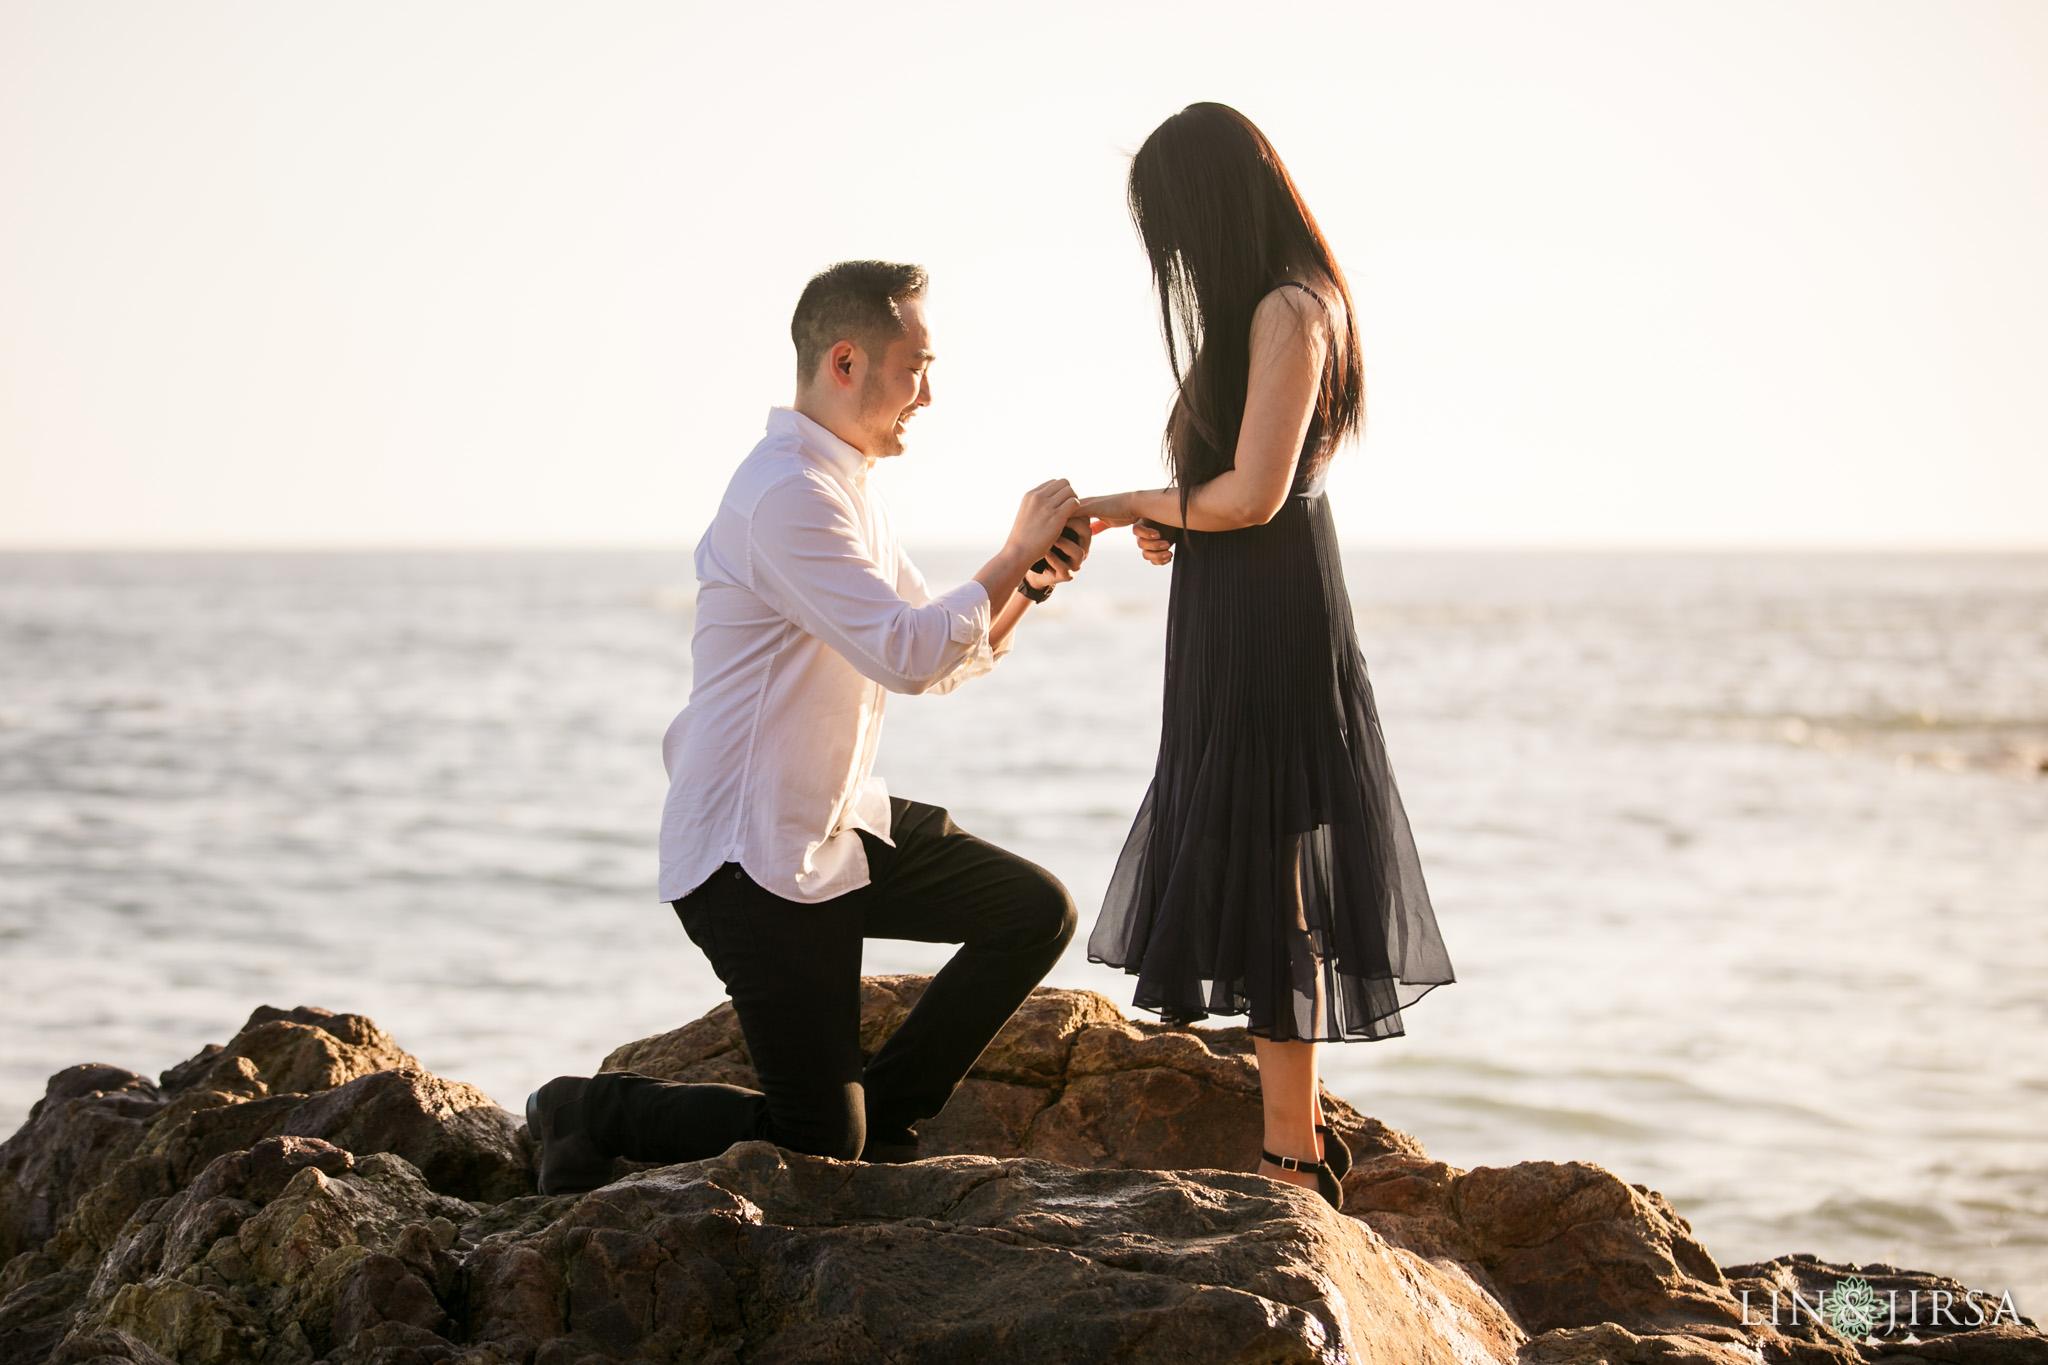 02 Heisler Beach Orange County Proposal Engagement Photography